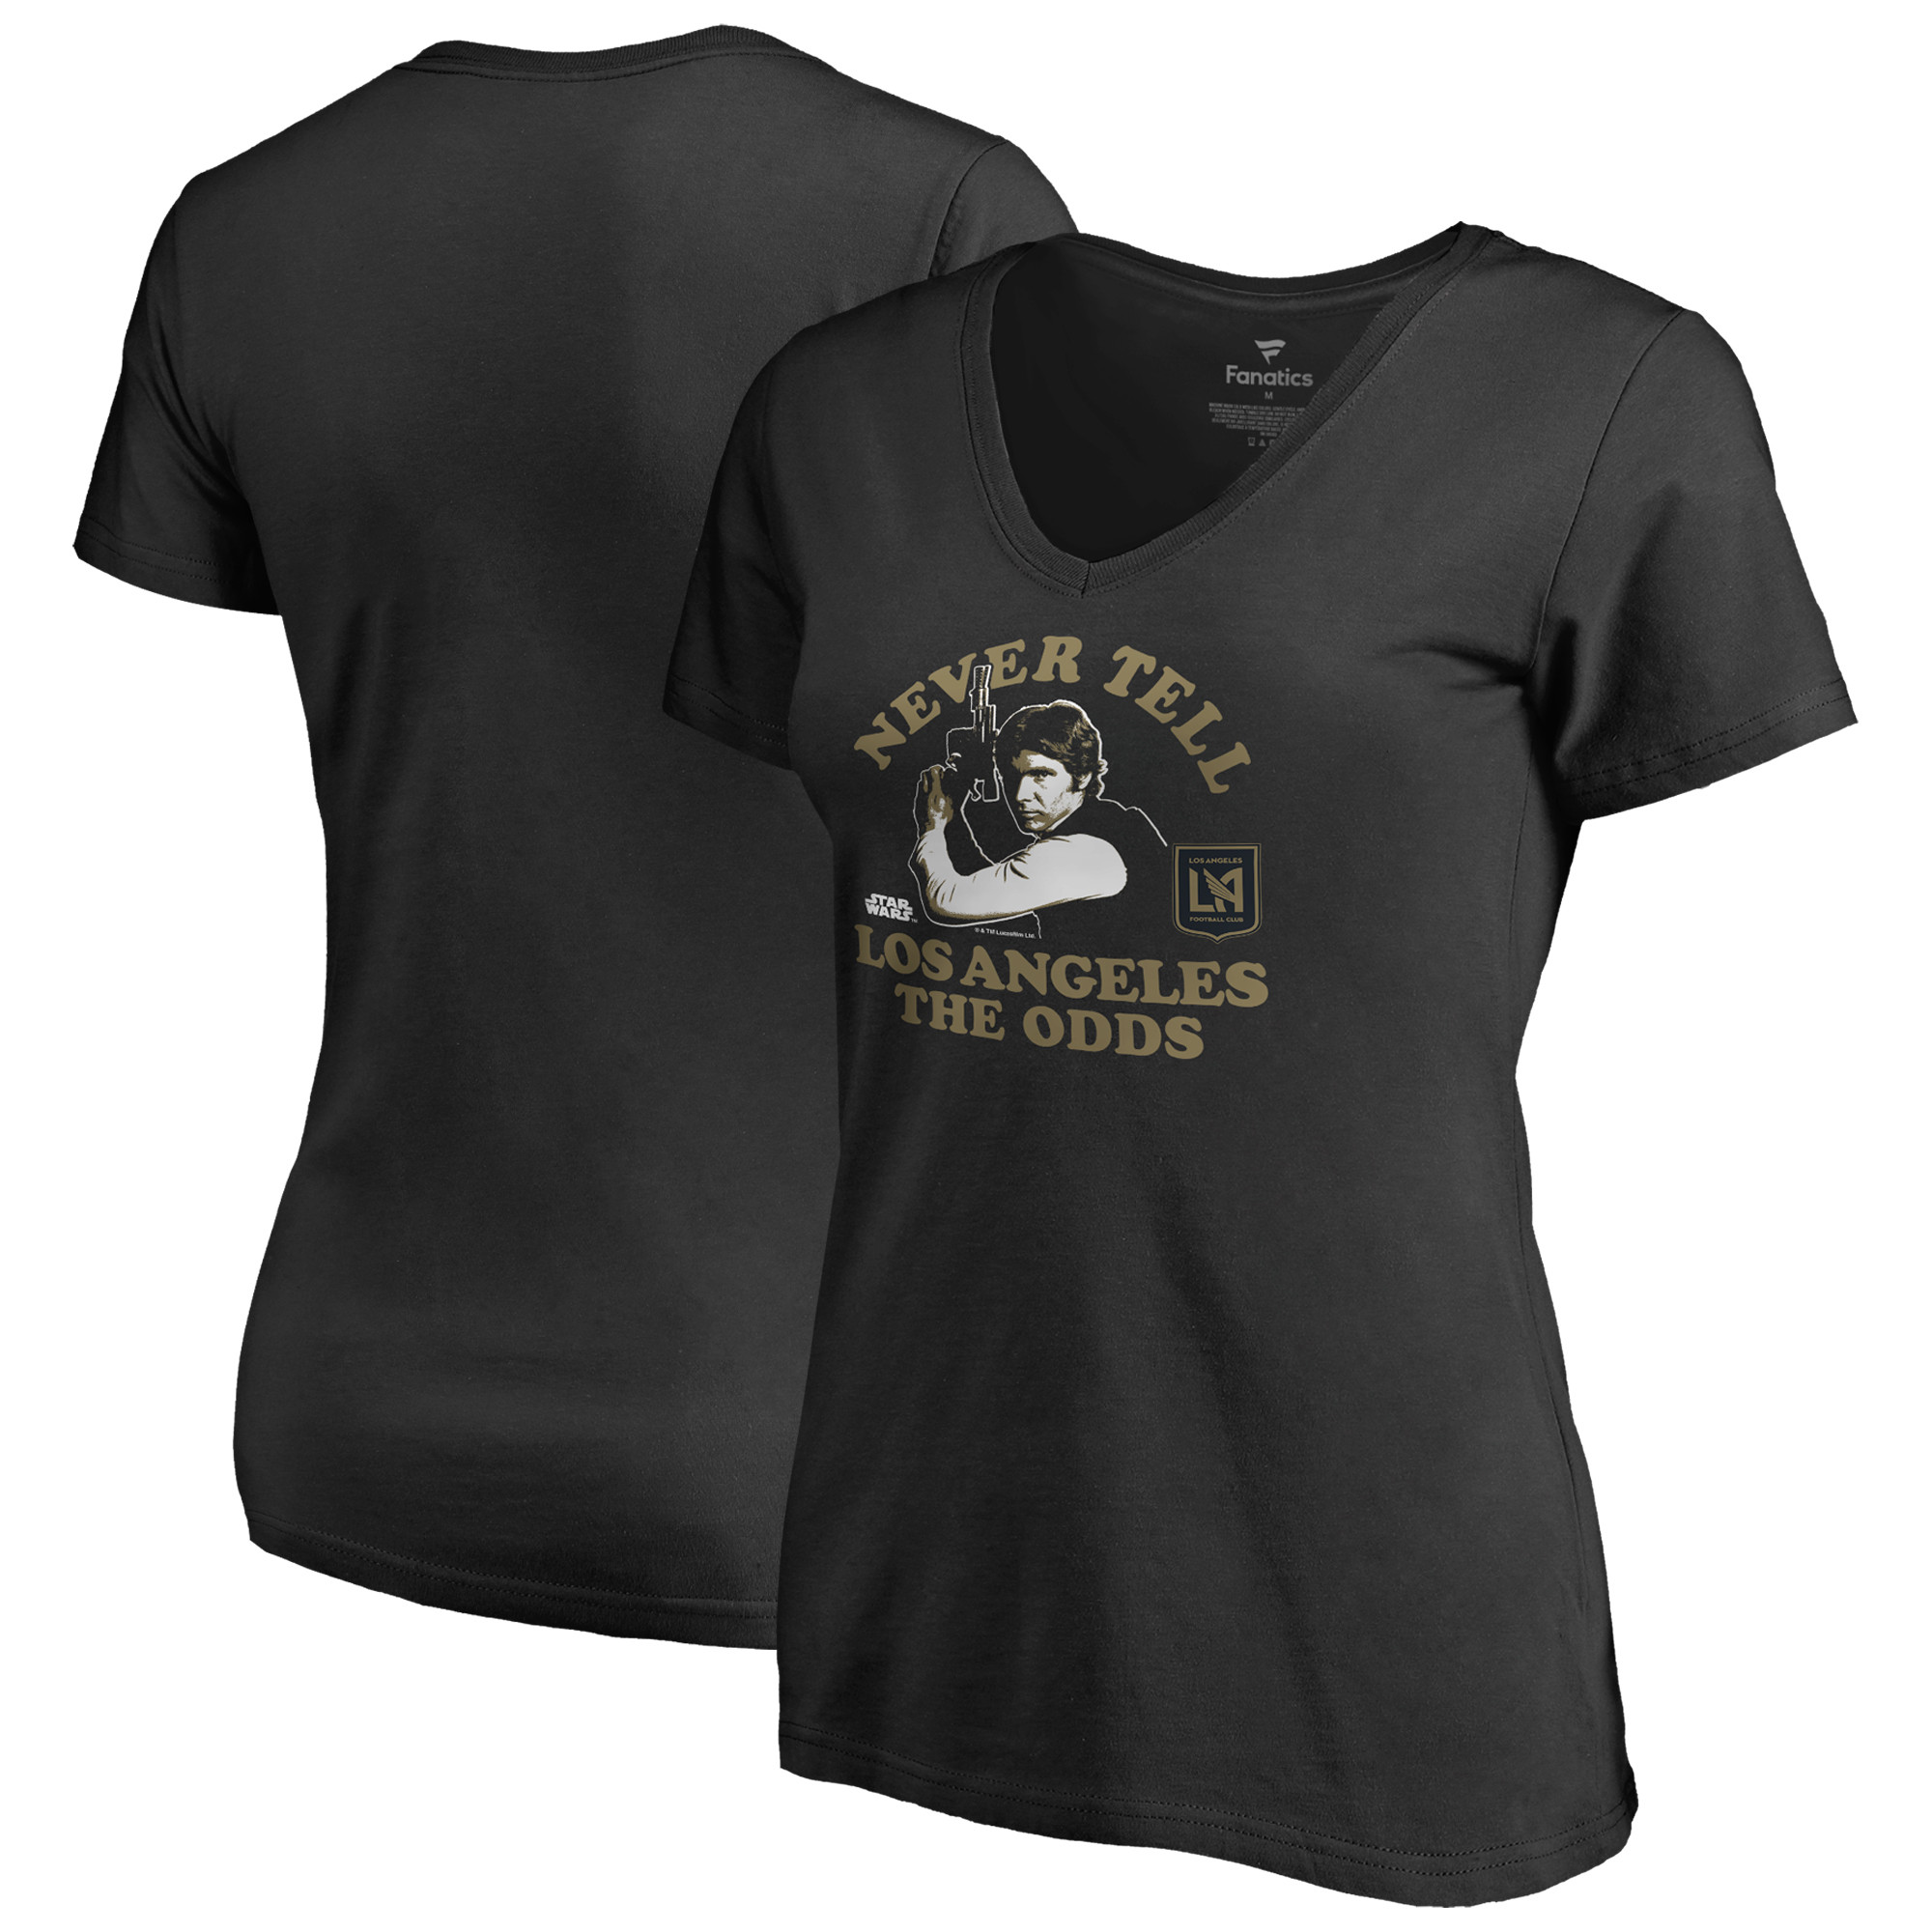 LAFC Fanatics Branded Women's Star Wars Never Tell the Odds V-Neck T-Shirt - Black